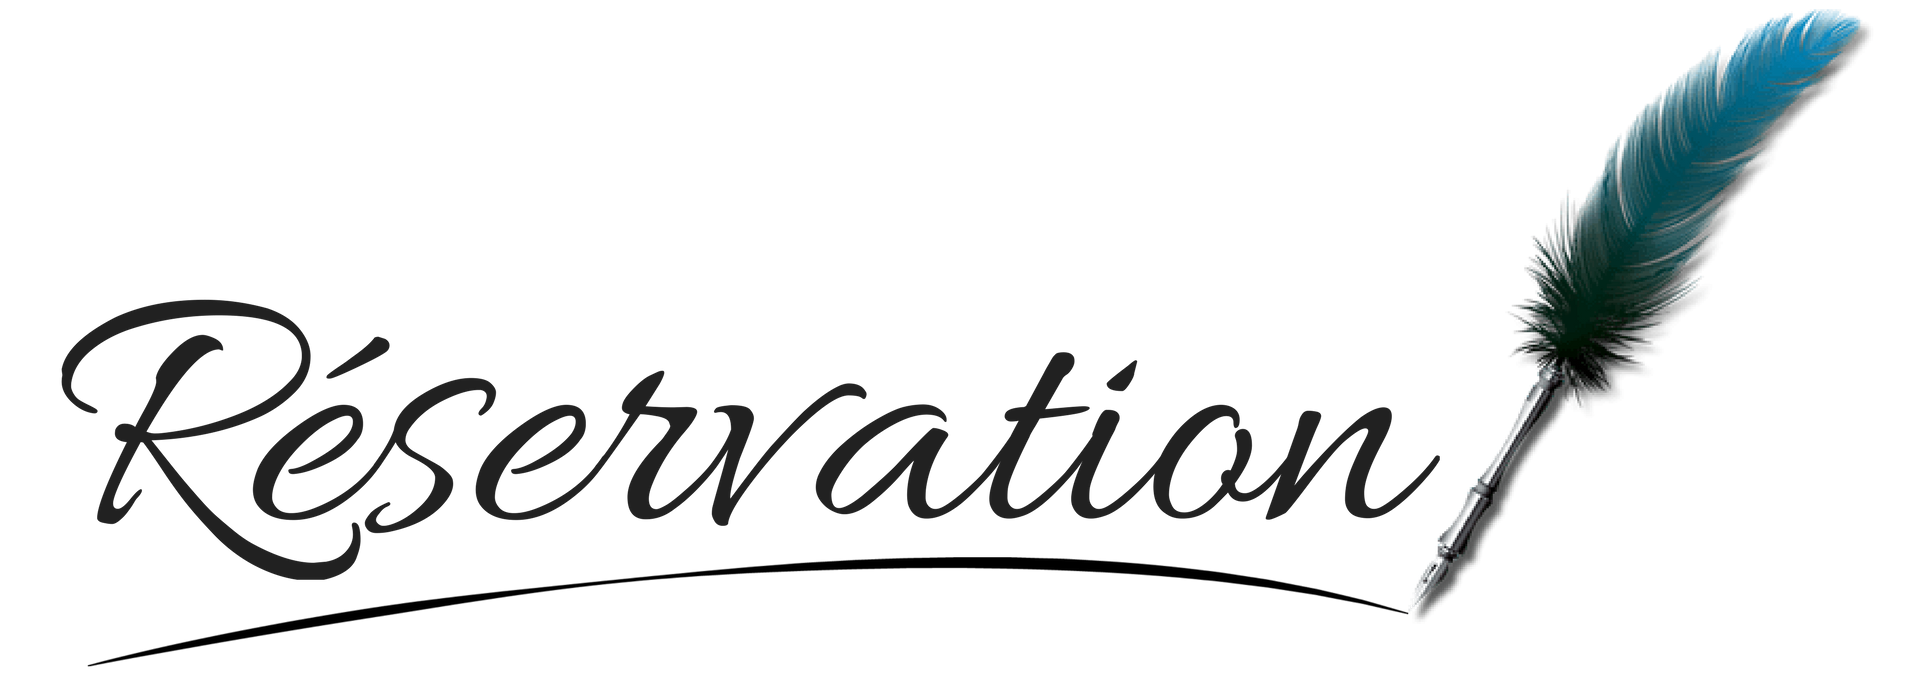 Reservation (2).png